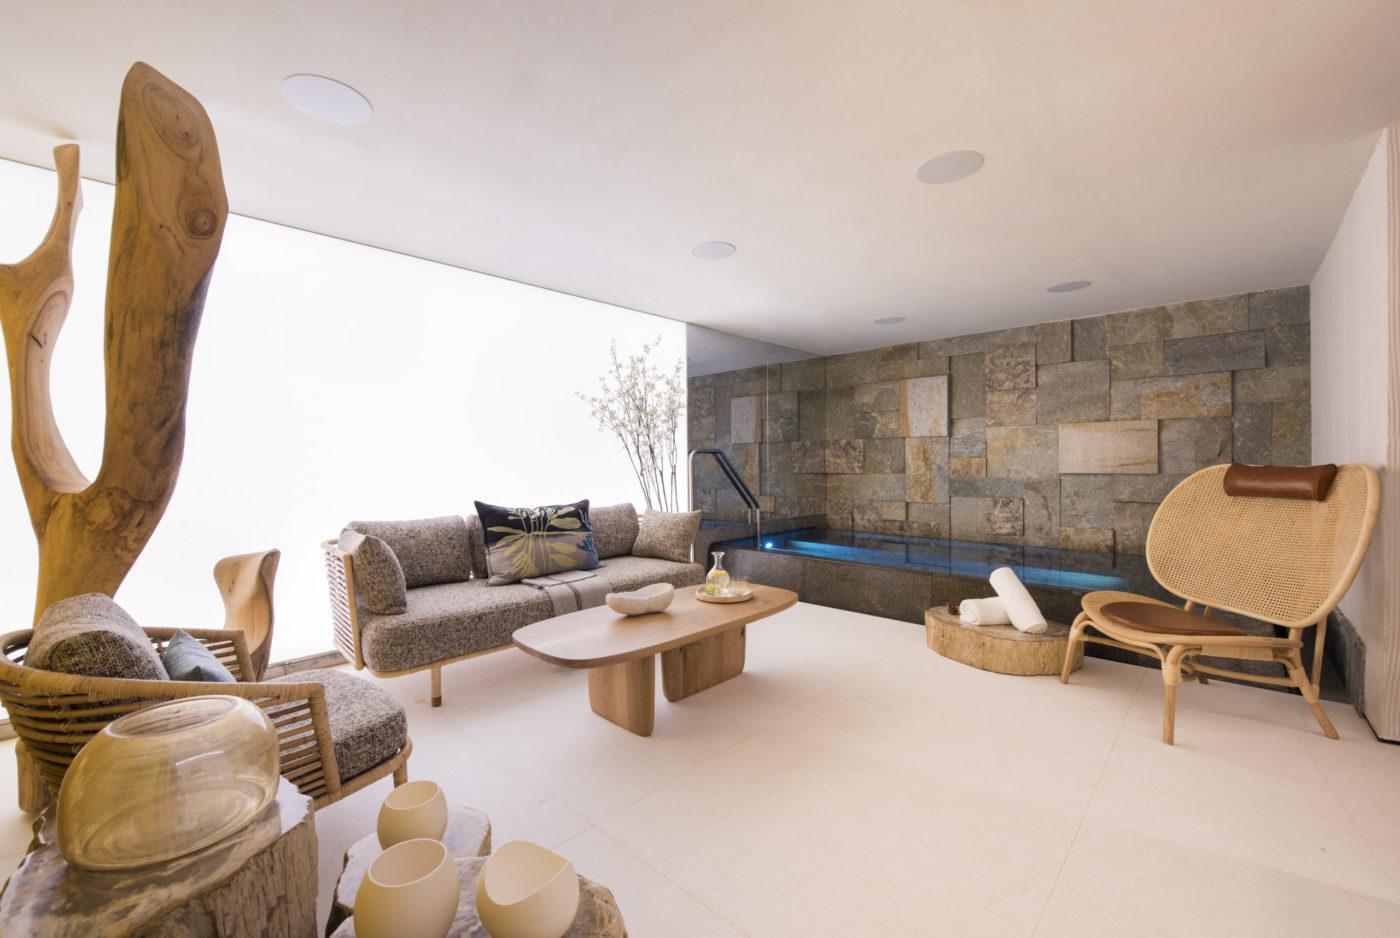 www.finest-holidays.com Chalet Denali, Zermatt, Valais, Switzerland